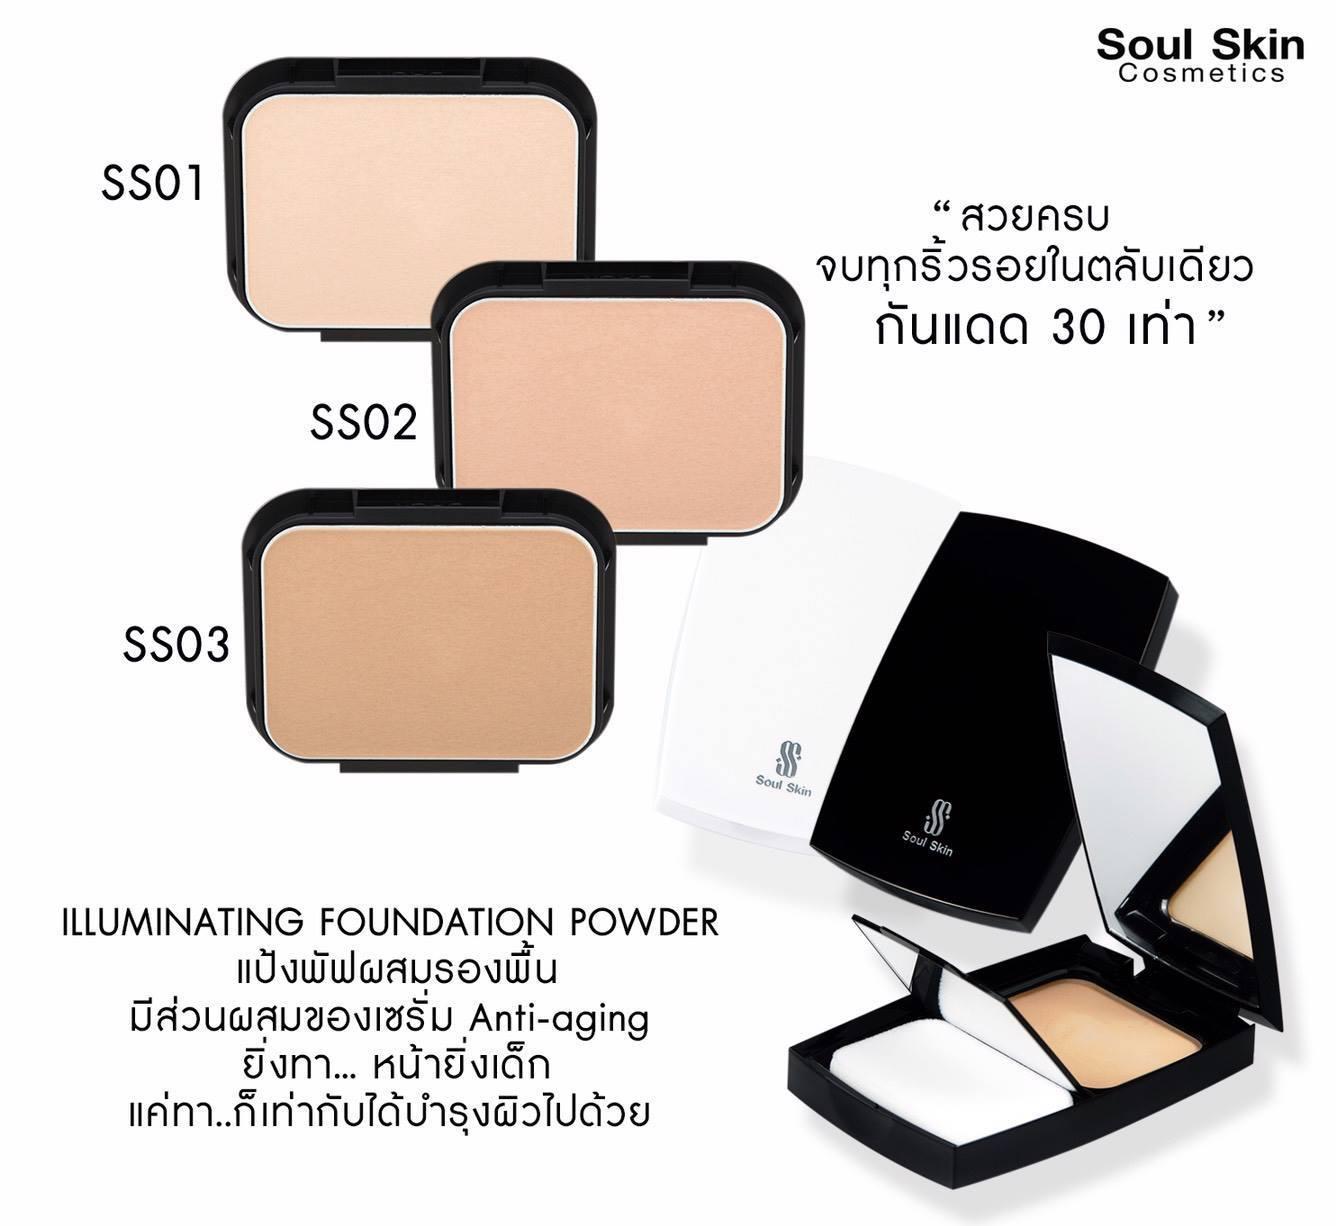 Soul Skin Illuminating Foundation Powder ที่สุดของแป้งหน้าเด็กแห่งปี ปาดปุ๊บ..เนียนกริ๊บ ปกปิดทันที แถมคุมมันได้ดีเยี่ยม แป้งพัฟผสมรองพื้น มาใหม่ล่าสุด เพียงแค่ทาหน้าก็เด็ก